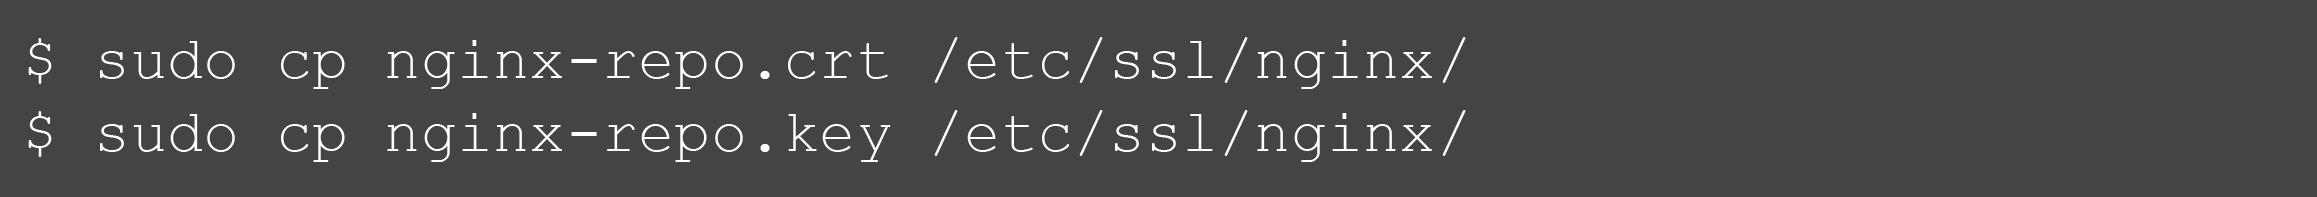 Download the files nginx-repo.key and nginx-repo.crt